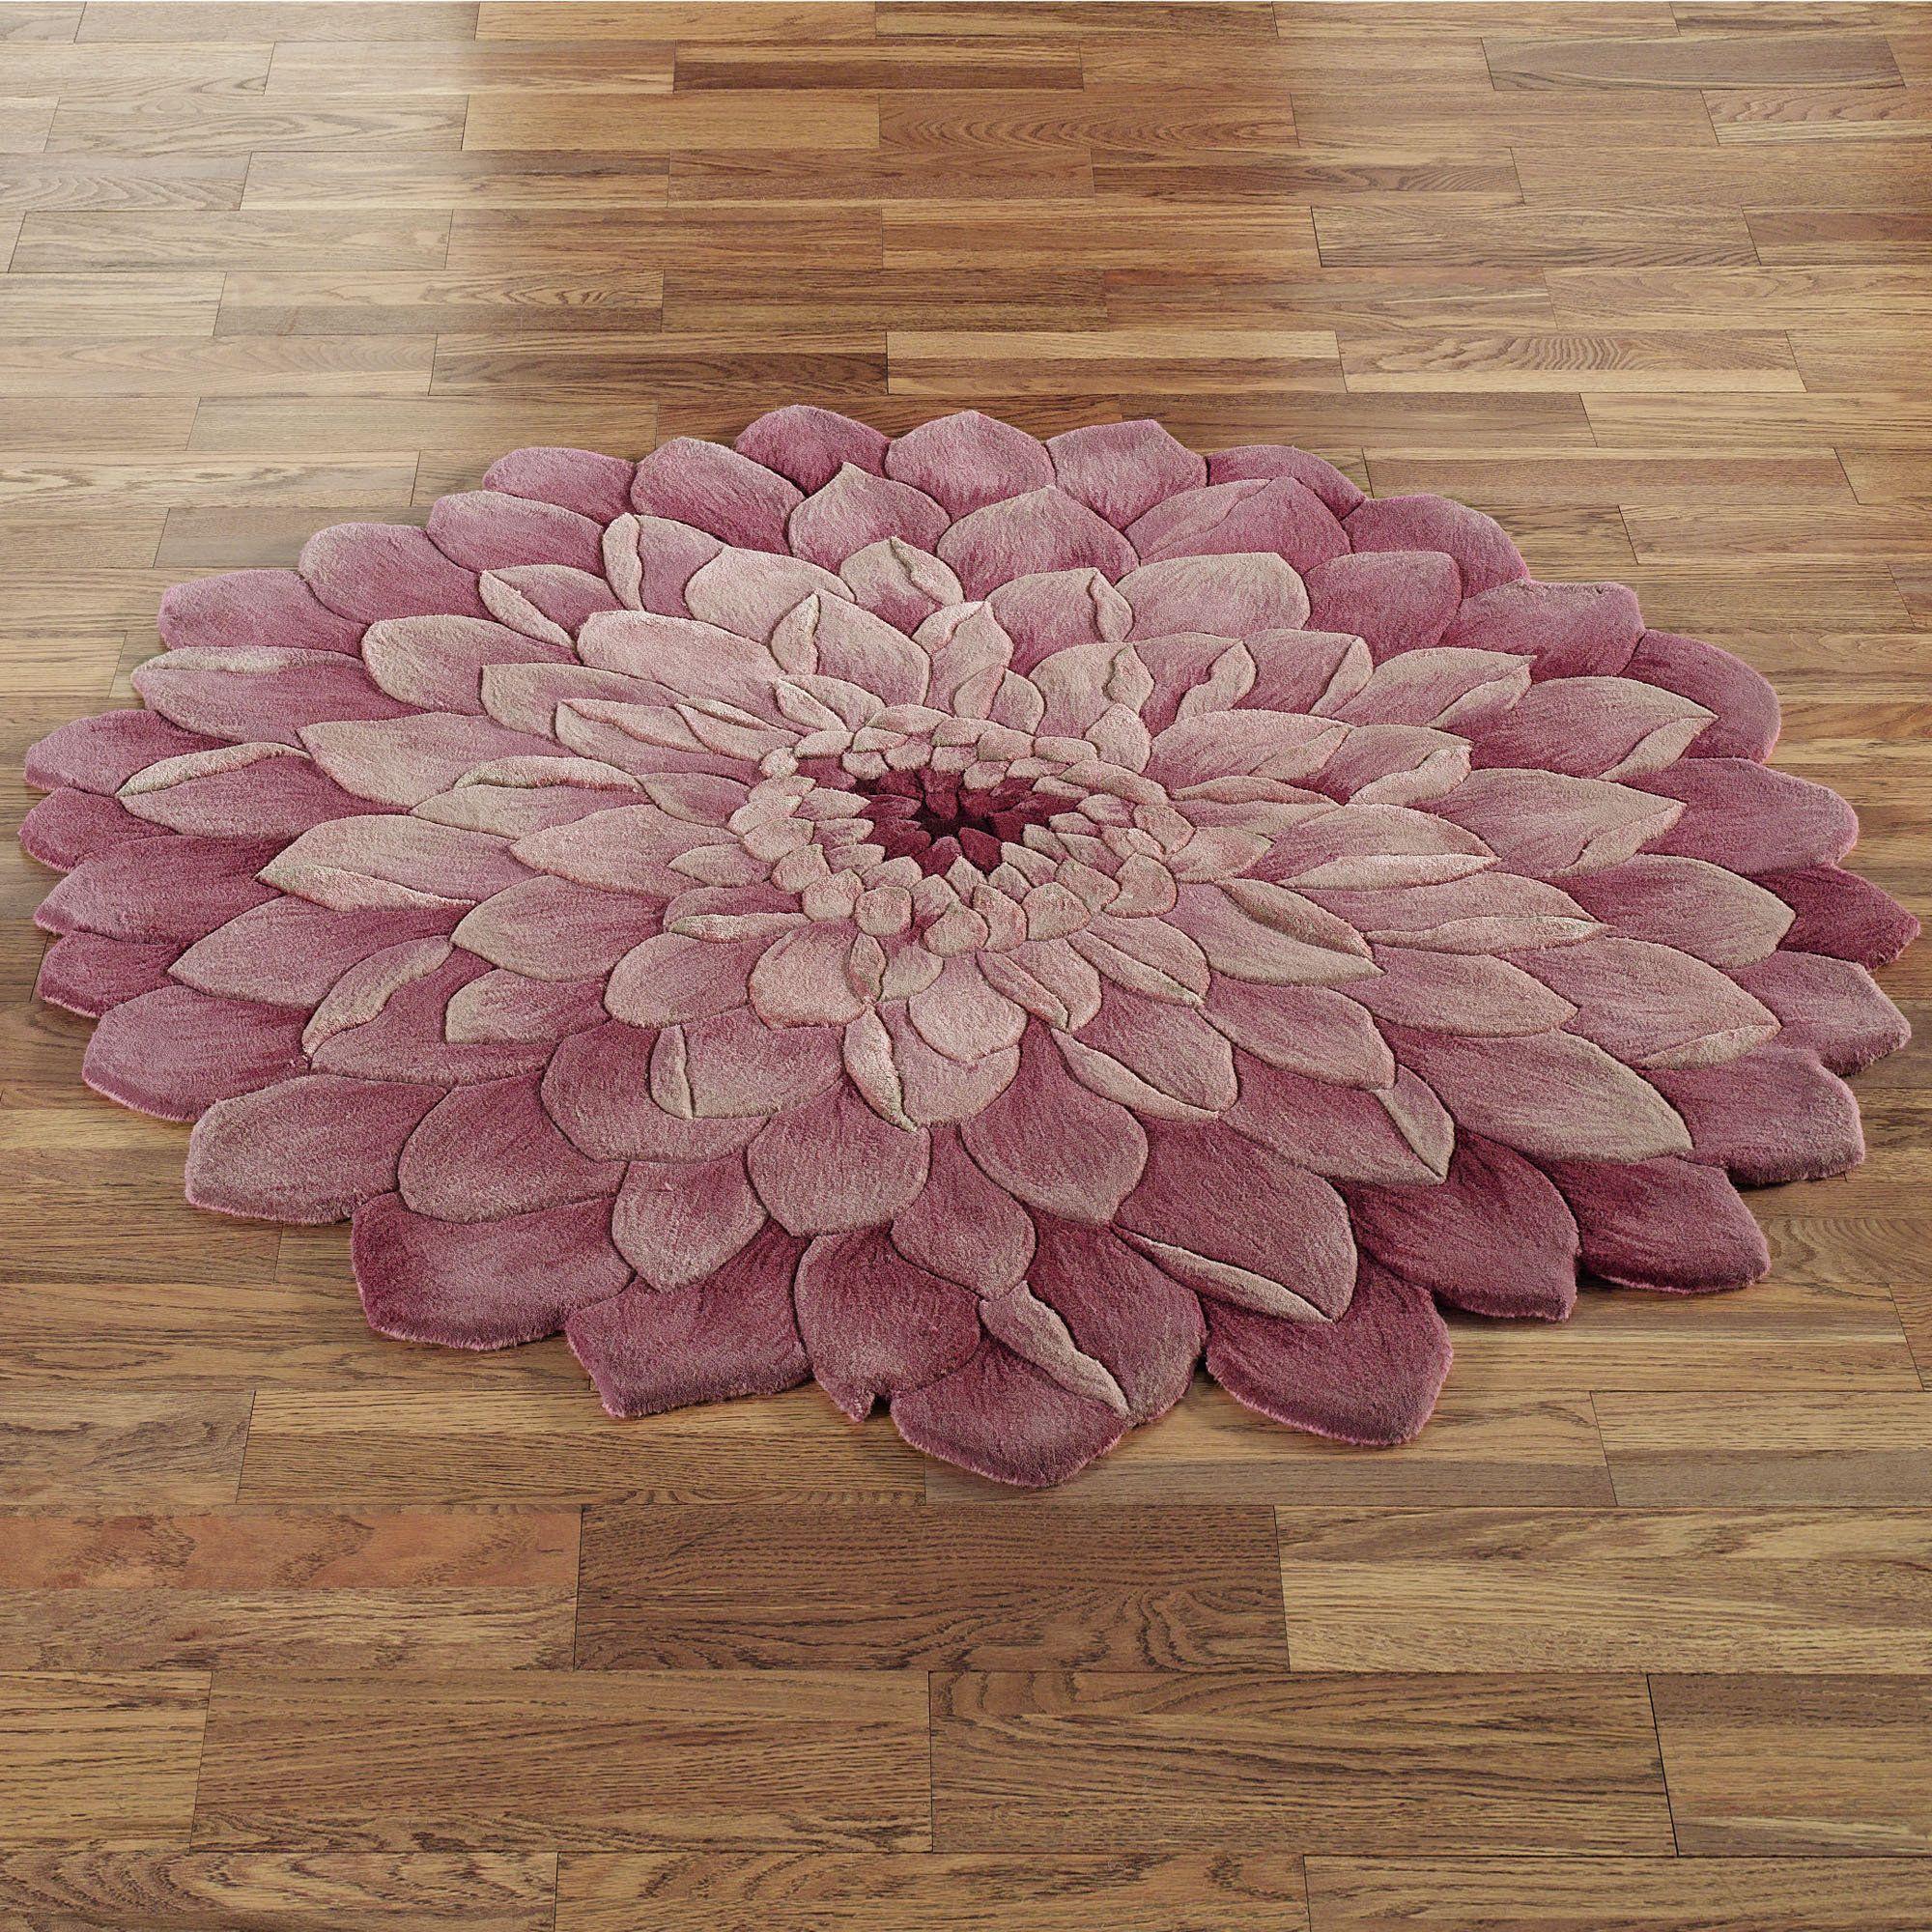 Adilyn mum flower shaped round rugs tapetes